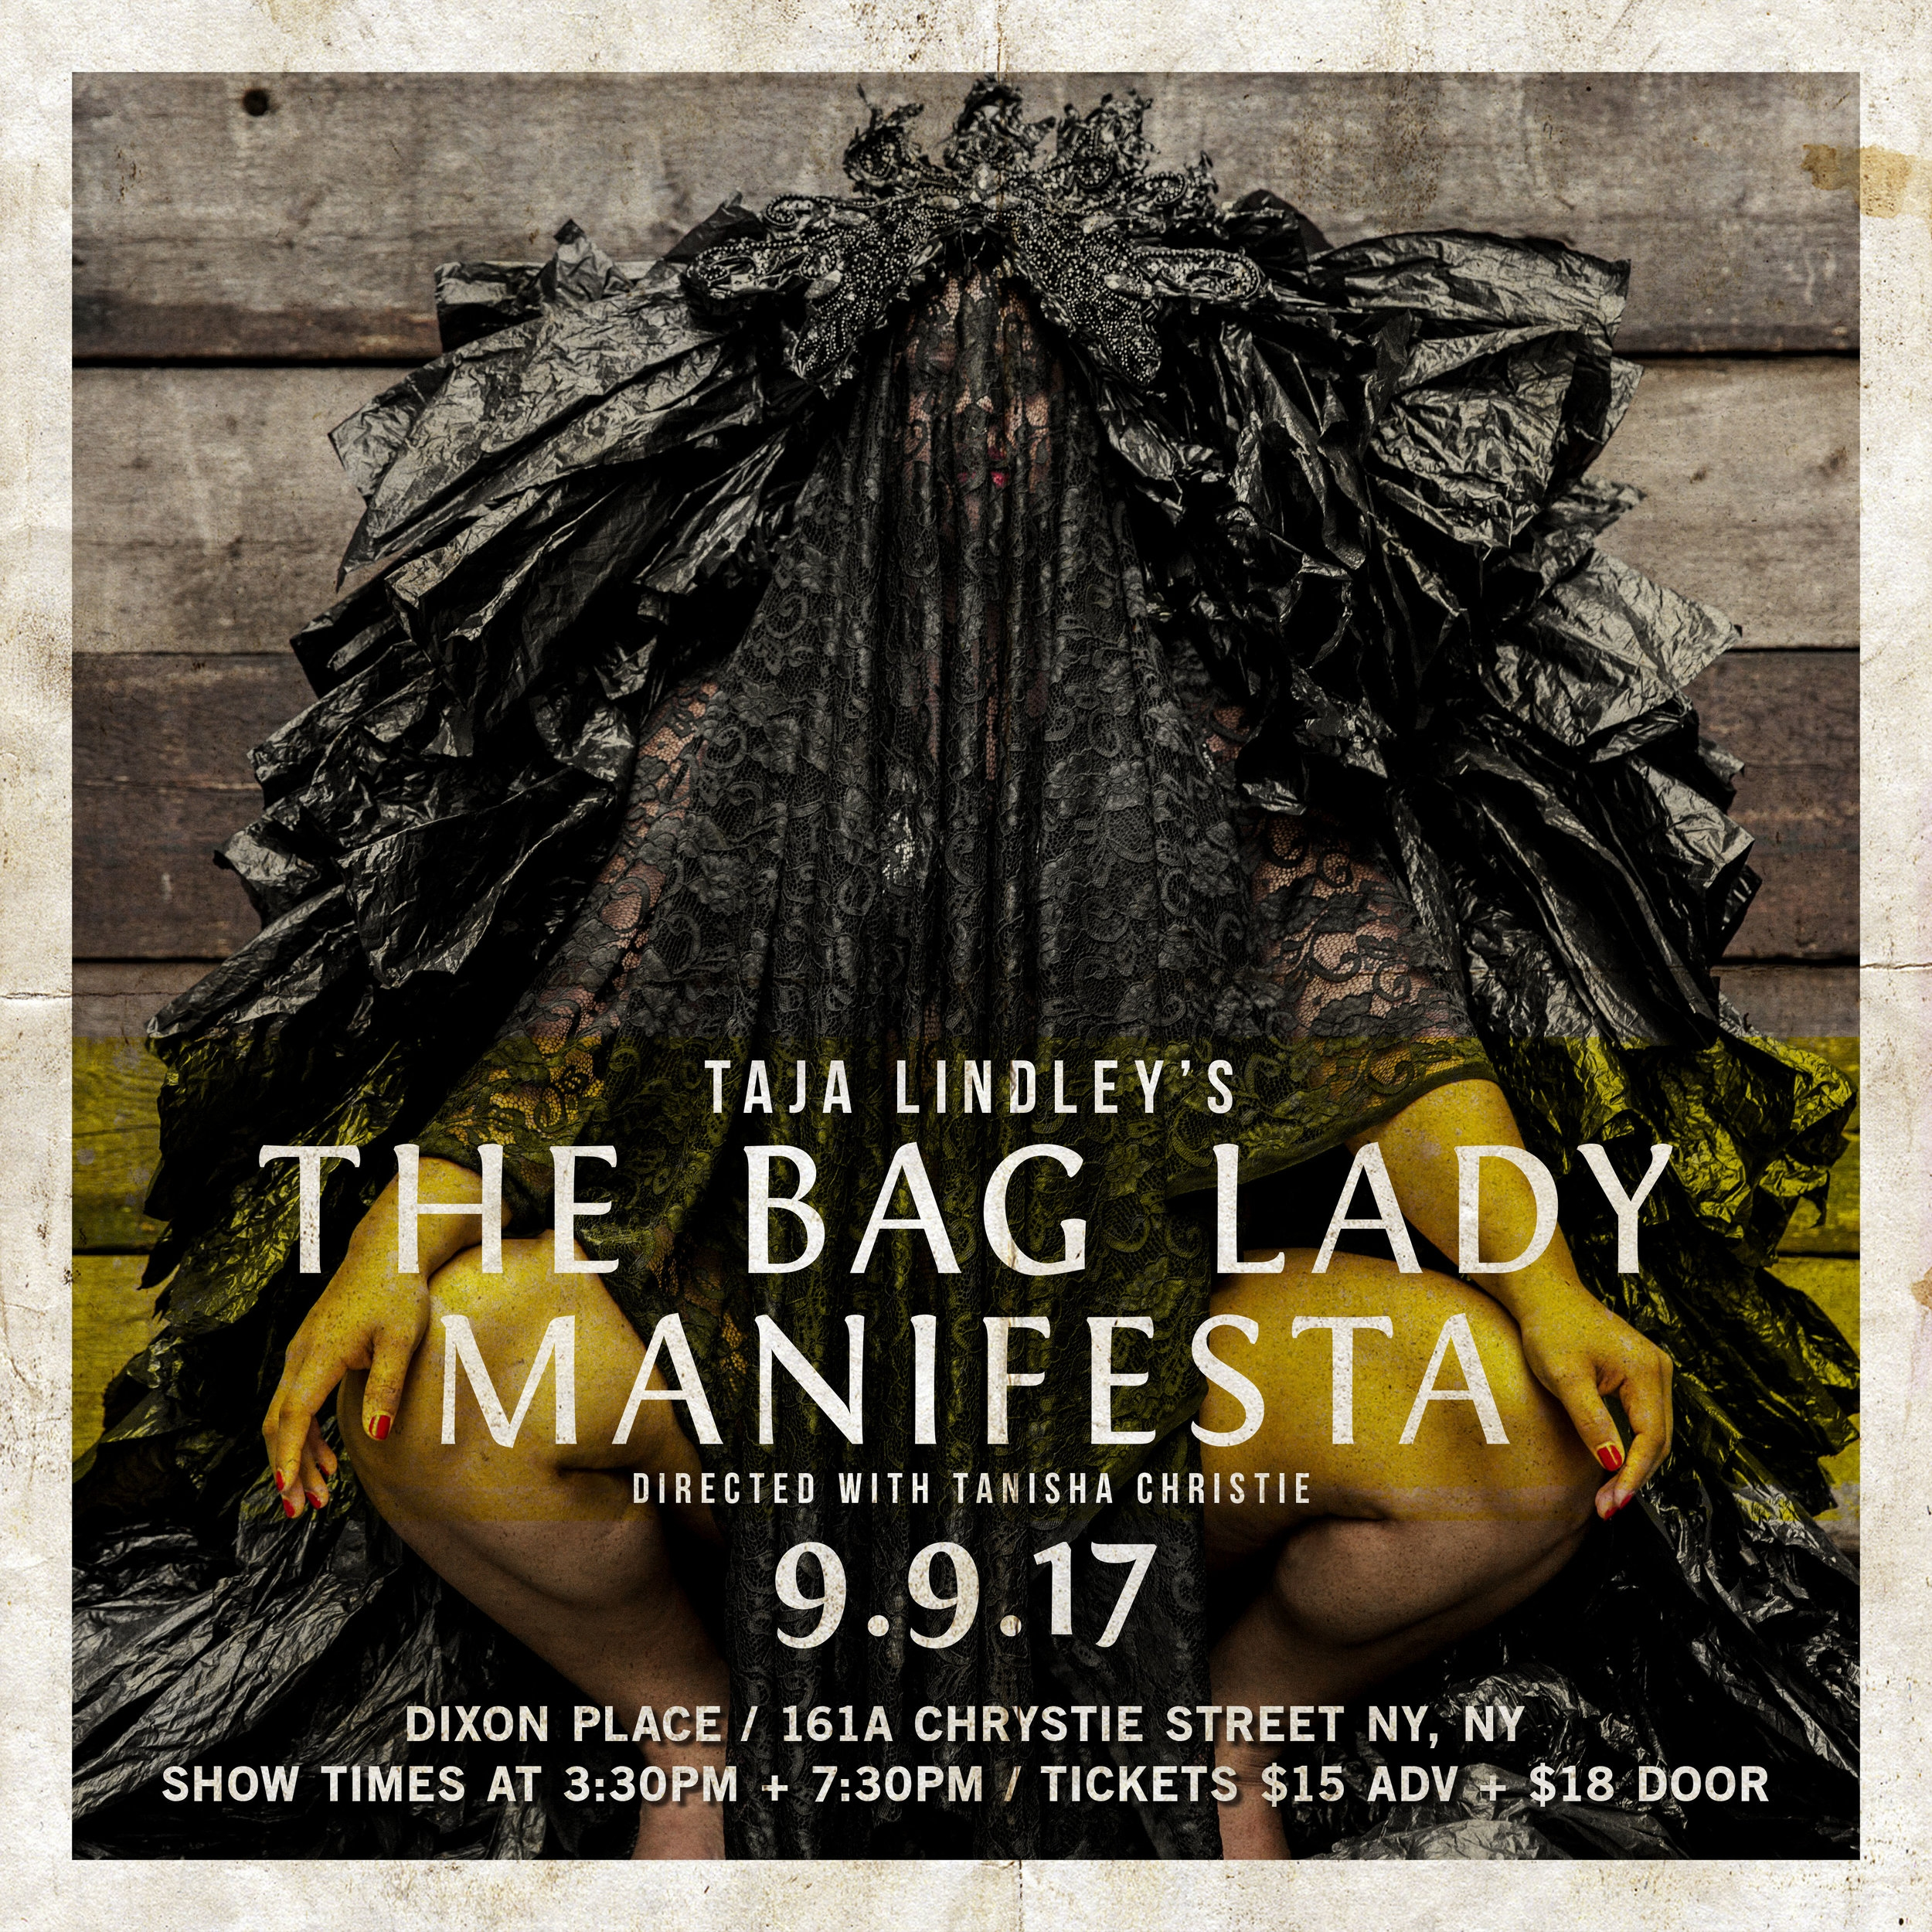 The Bag Lady Manifesta IG flyer - TL edit.jpg